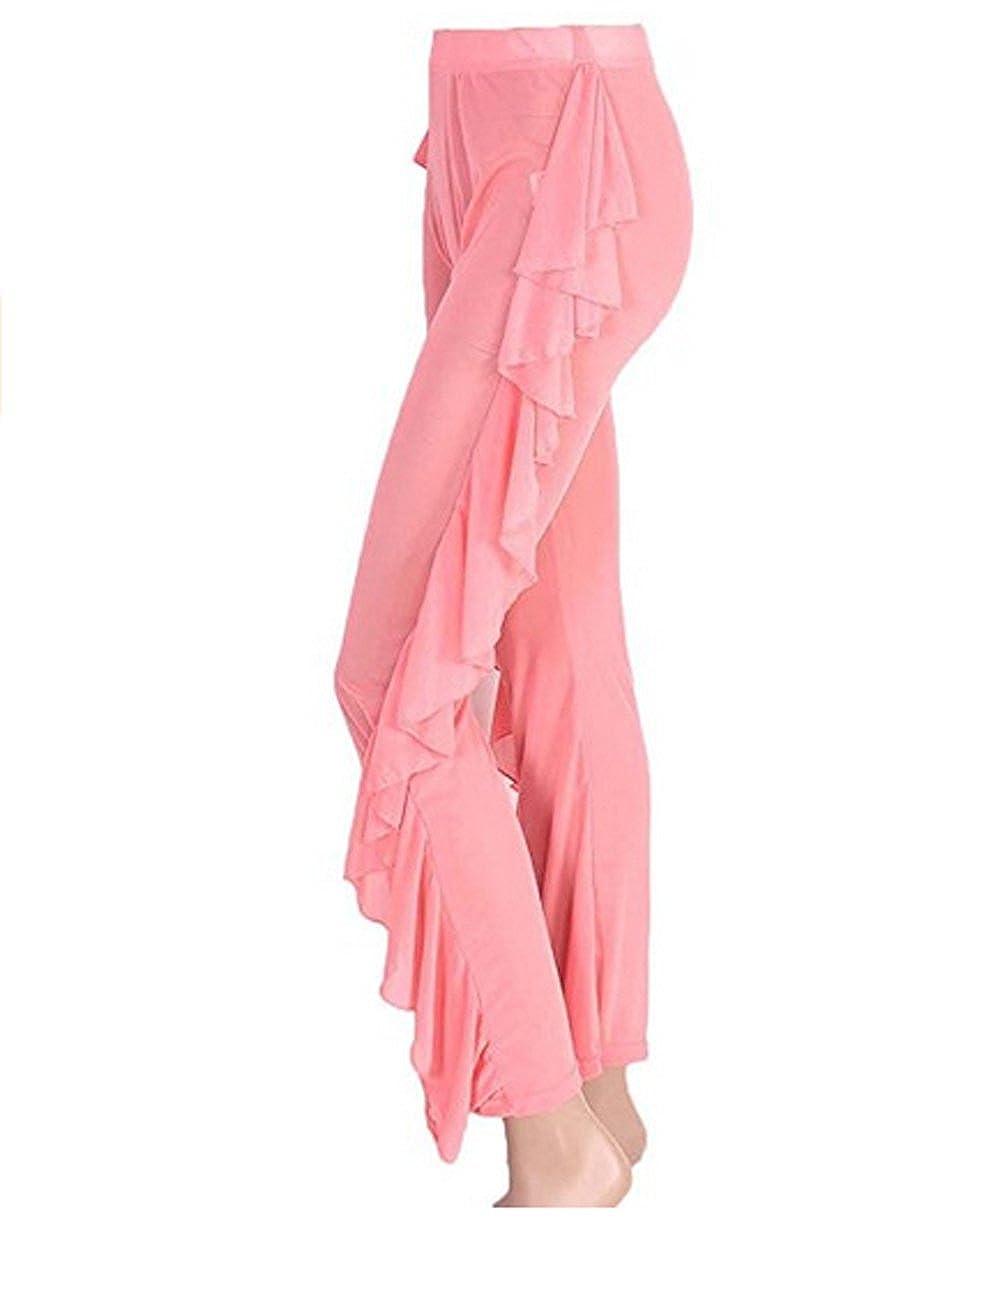 a8db41bd74 Rachel Charm Sexy Women High Waist See-Through Ruffle Sheer Bikini Bottom  Cover-up Pants: Amazon.ca: Clothing & Accessories